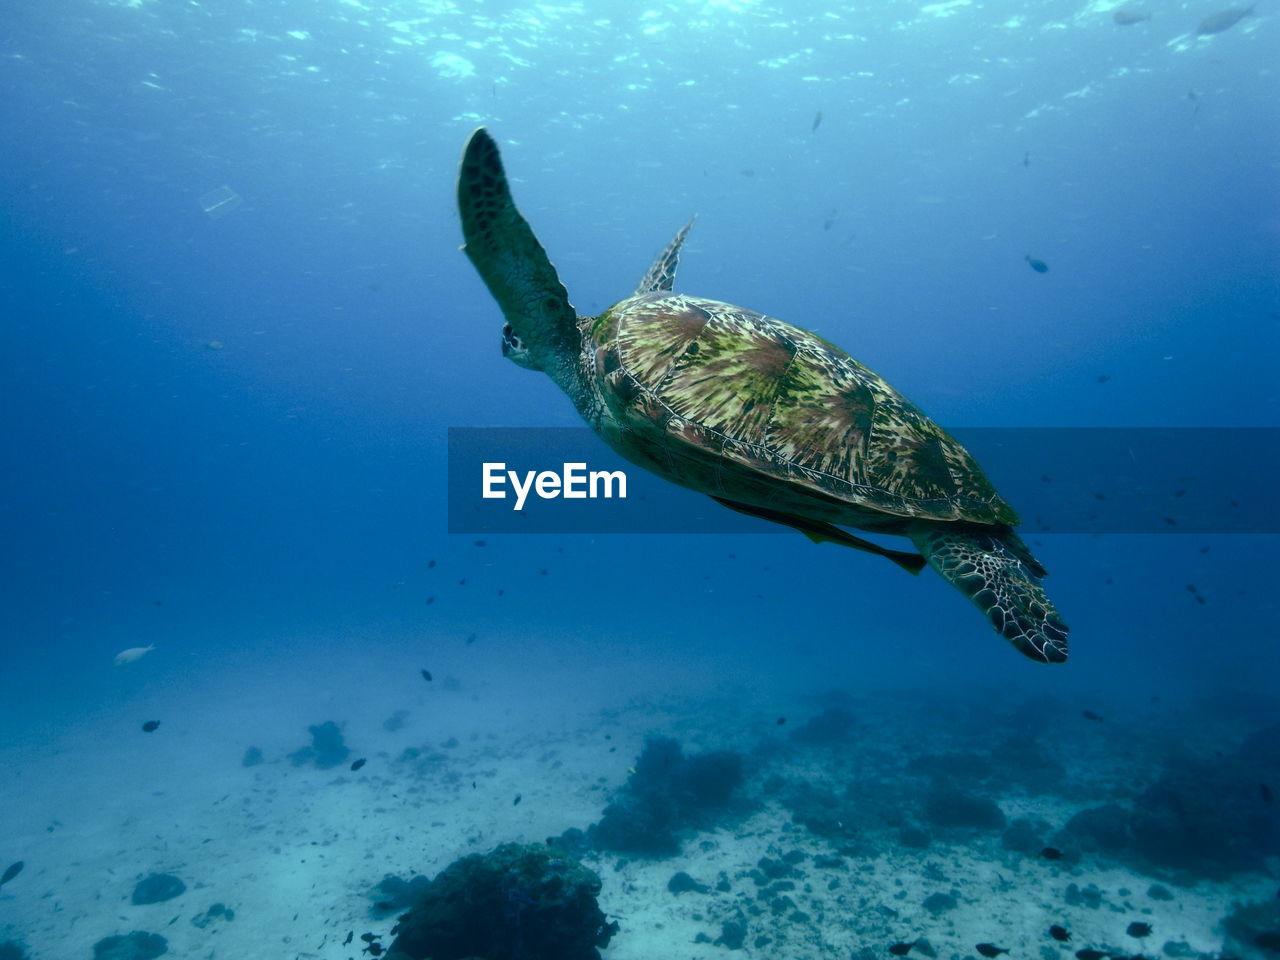 animal, underwater, sea, animal themes, swimming, animals in the wild, animal wildlife, water, undersea, one animal, sea life, marine, vertebrate, fish, turtle, blue, nature, reptile, no people